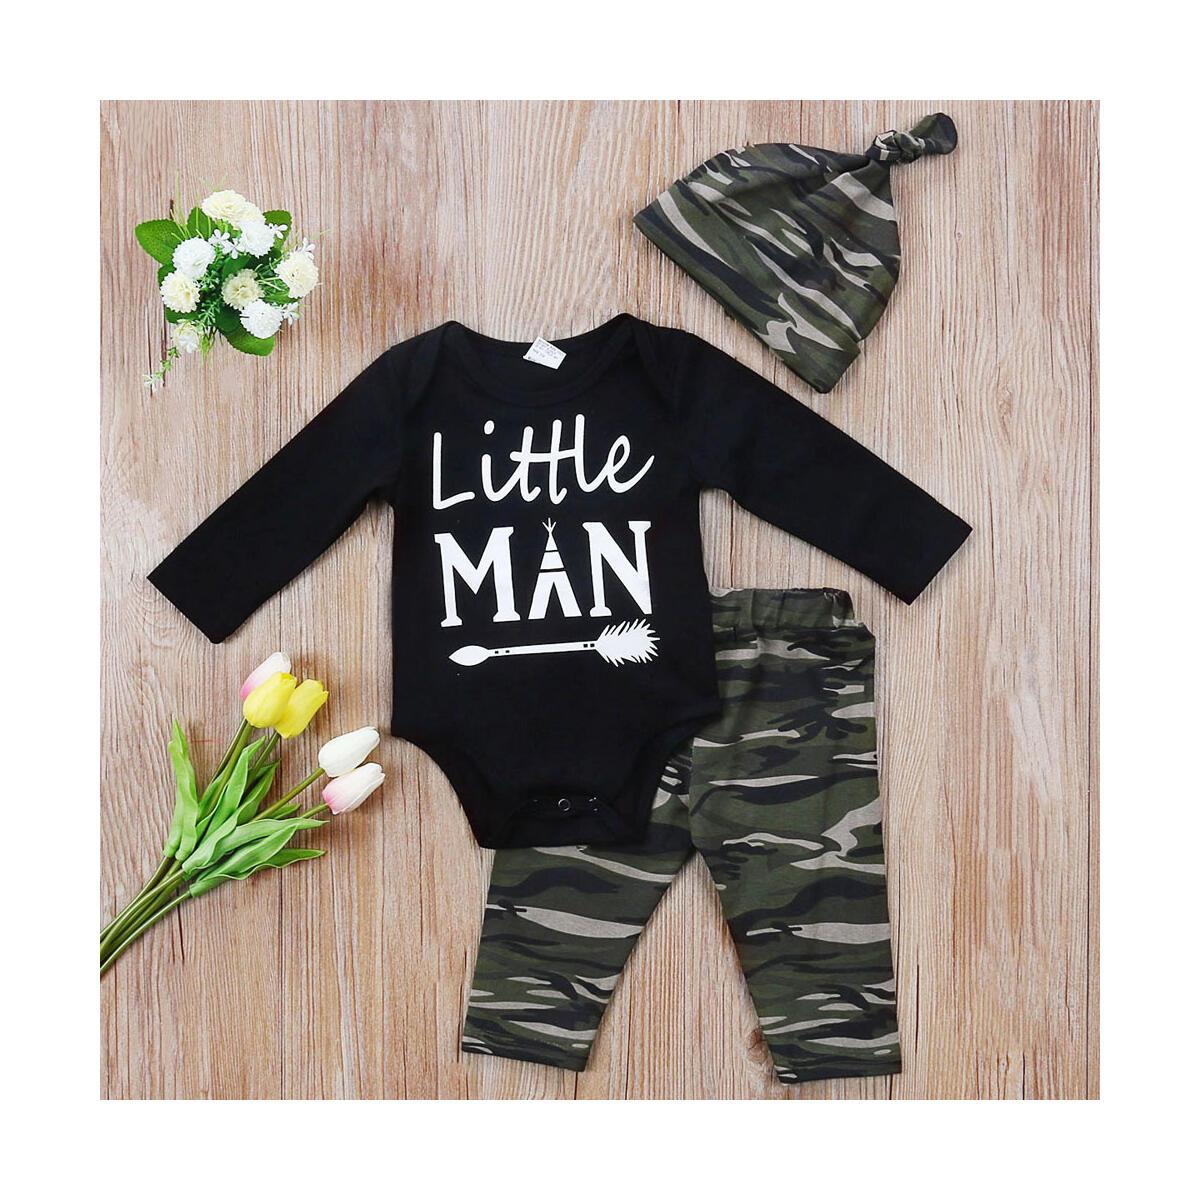 Newborn Baby Boy Clothes Little Man Romper Top Pants Hat Long Sleeve Outfits Set